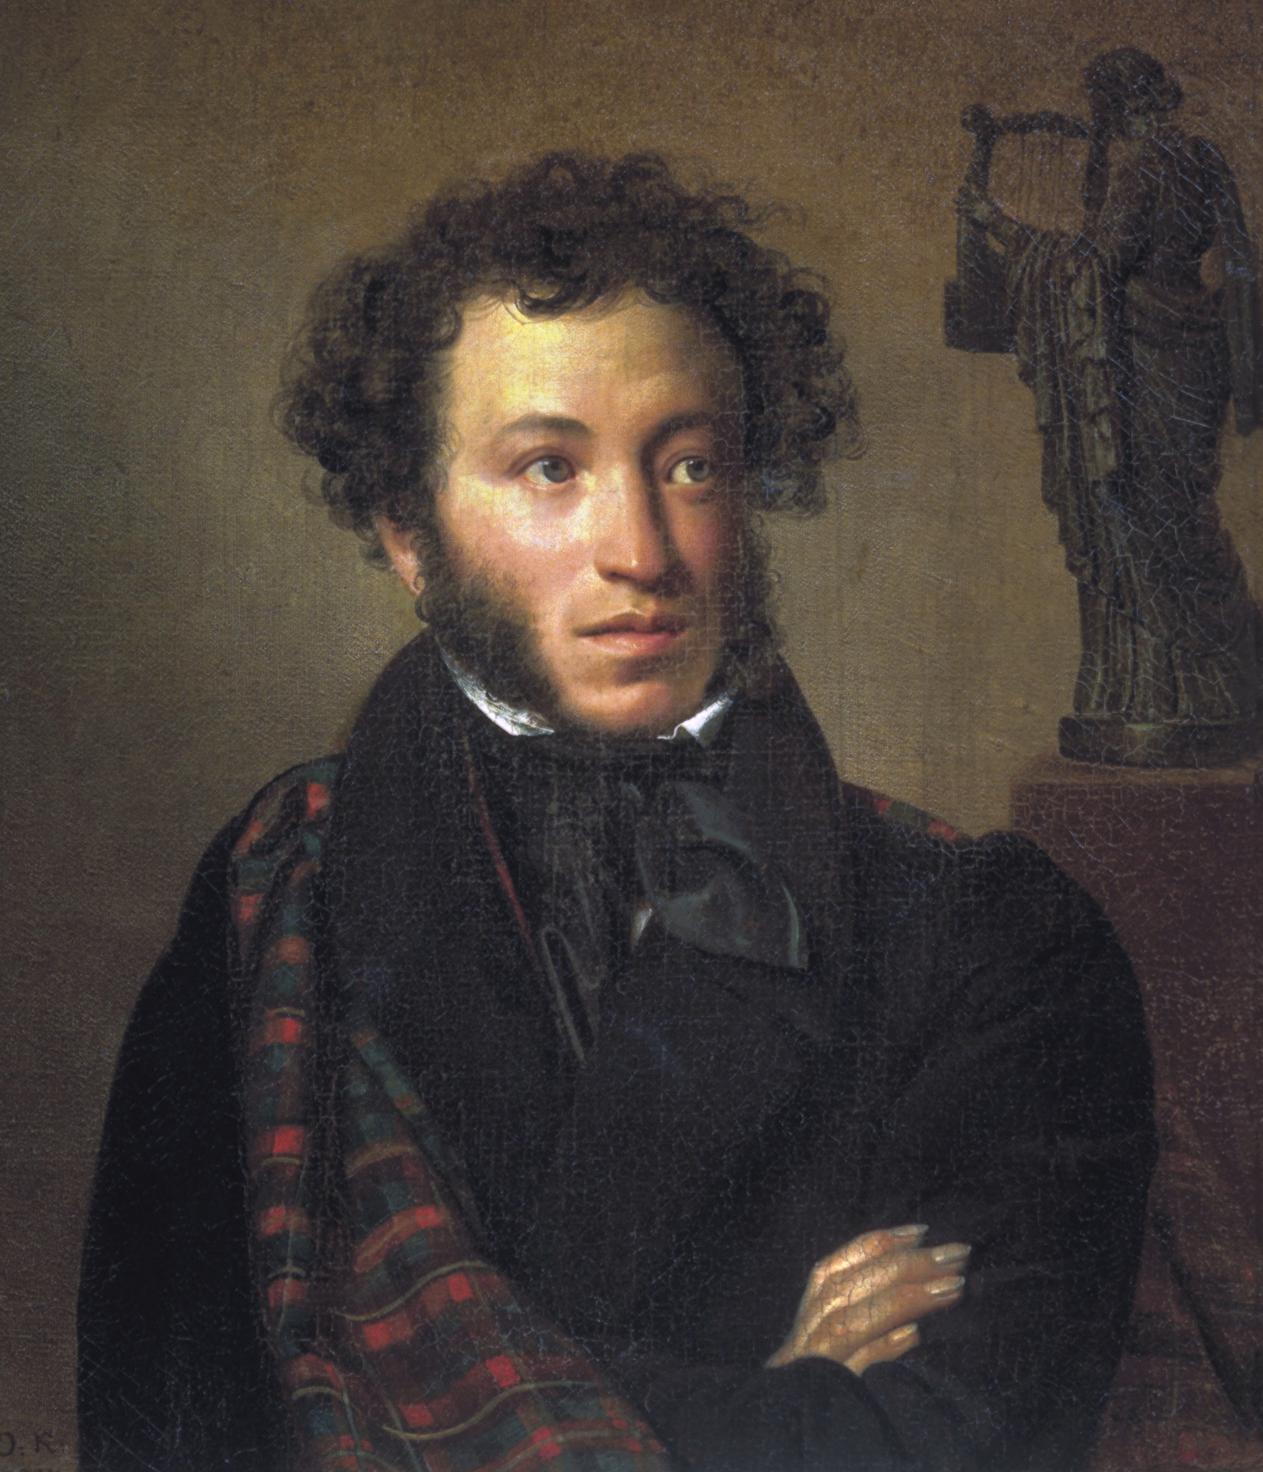 https://upload.wikimedia.org/wikipedia/commons/5/56/Portrait_of_Alexander_Pushkin_%28Orest_Kiprensky%2C_1827%29.PNG